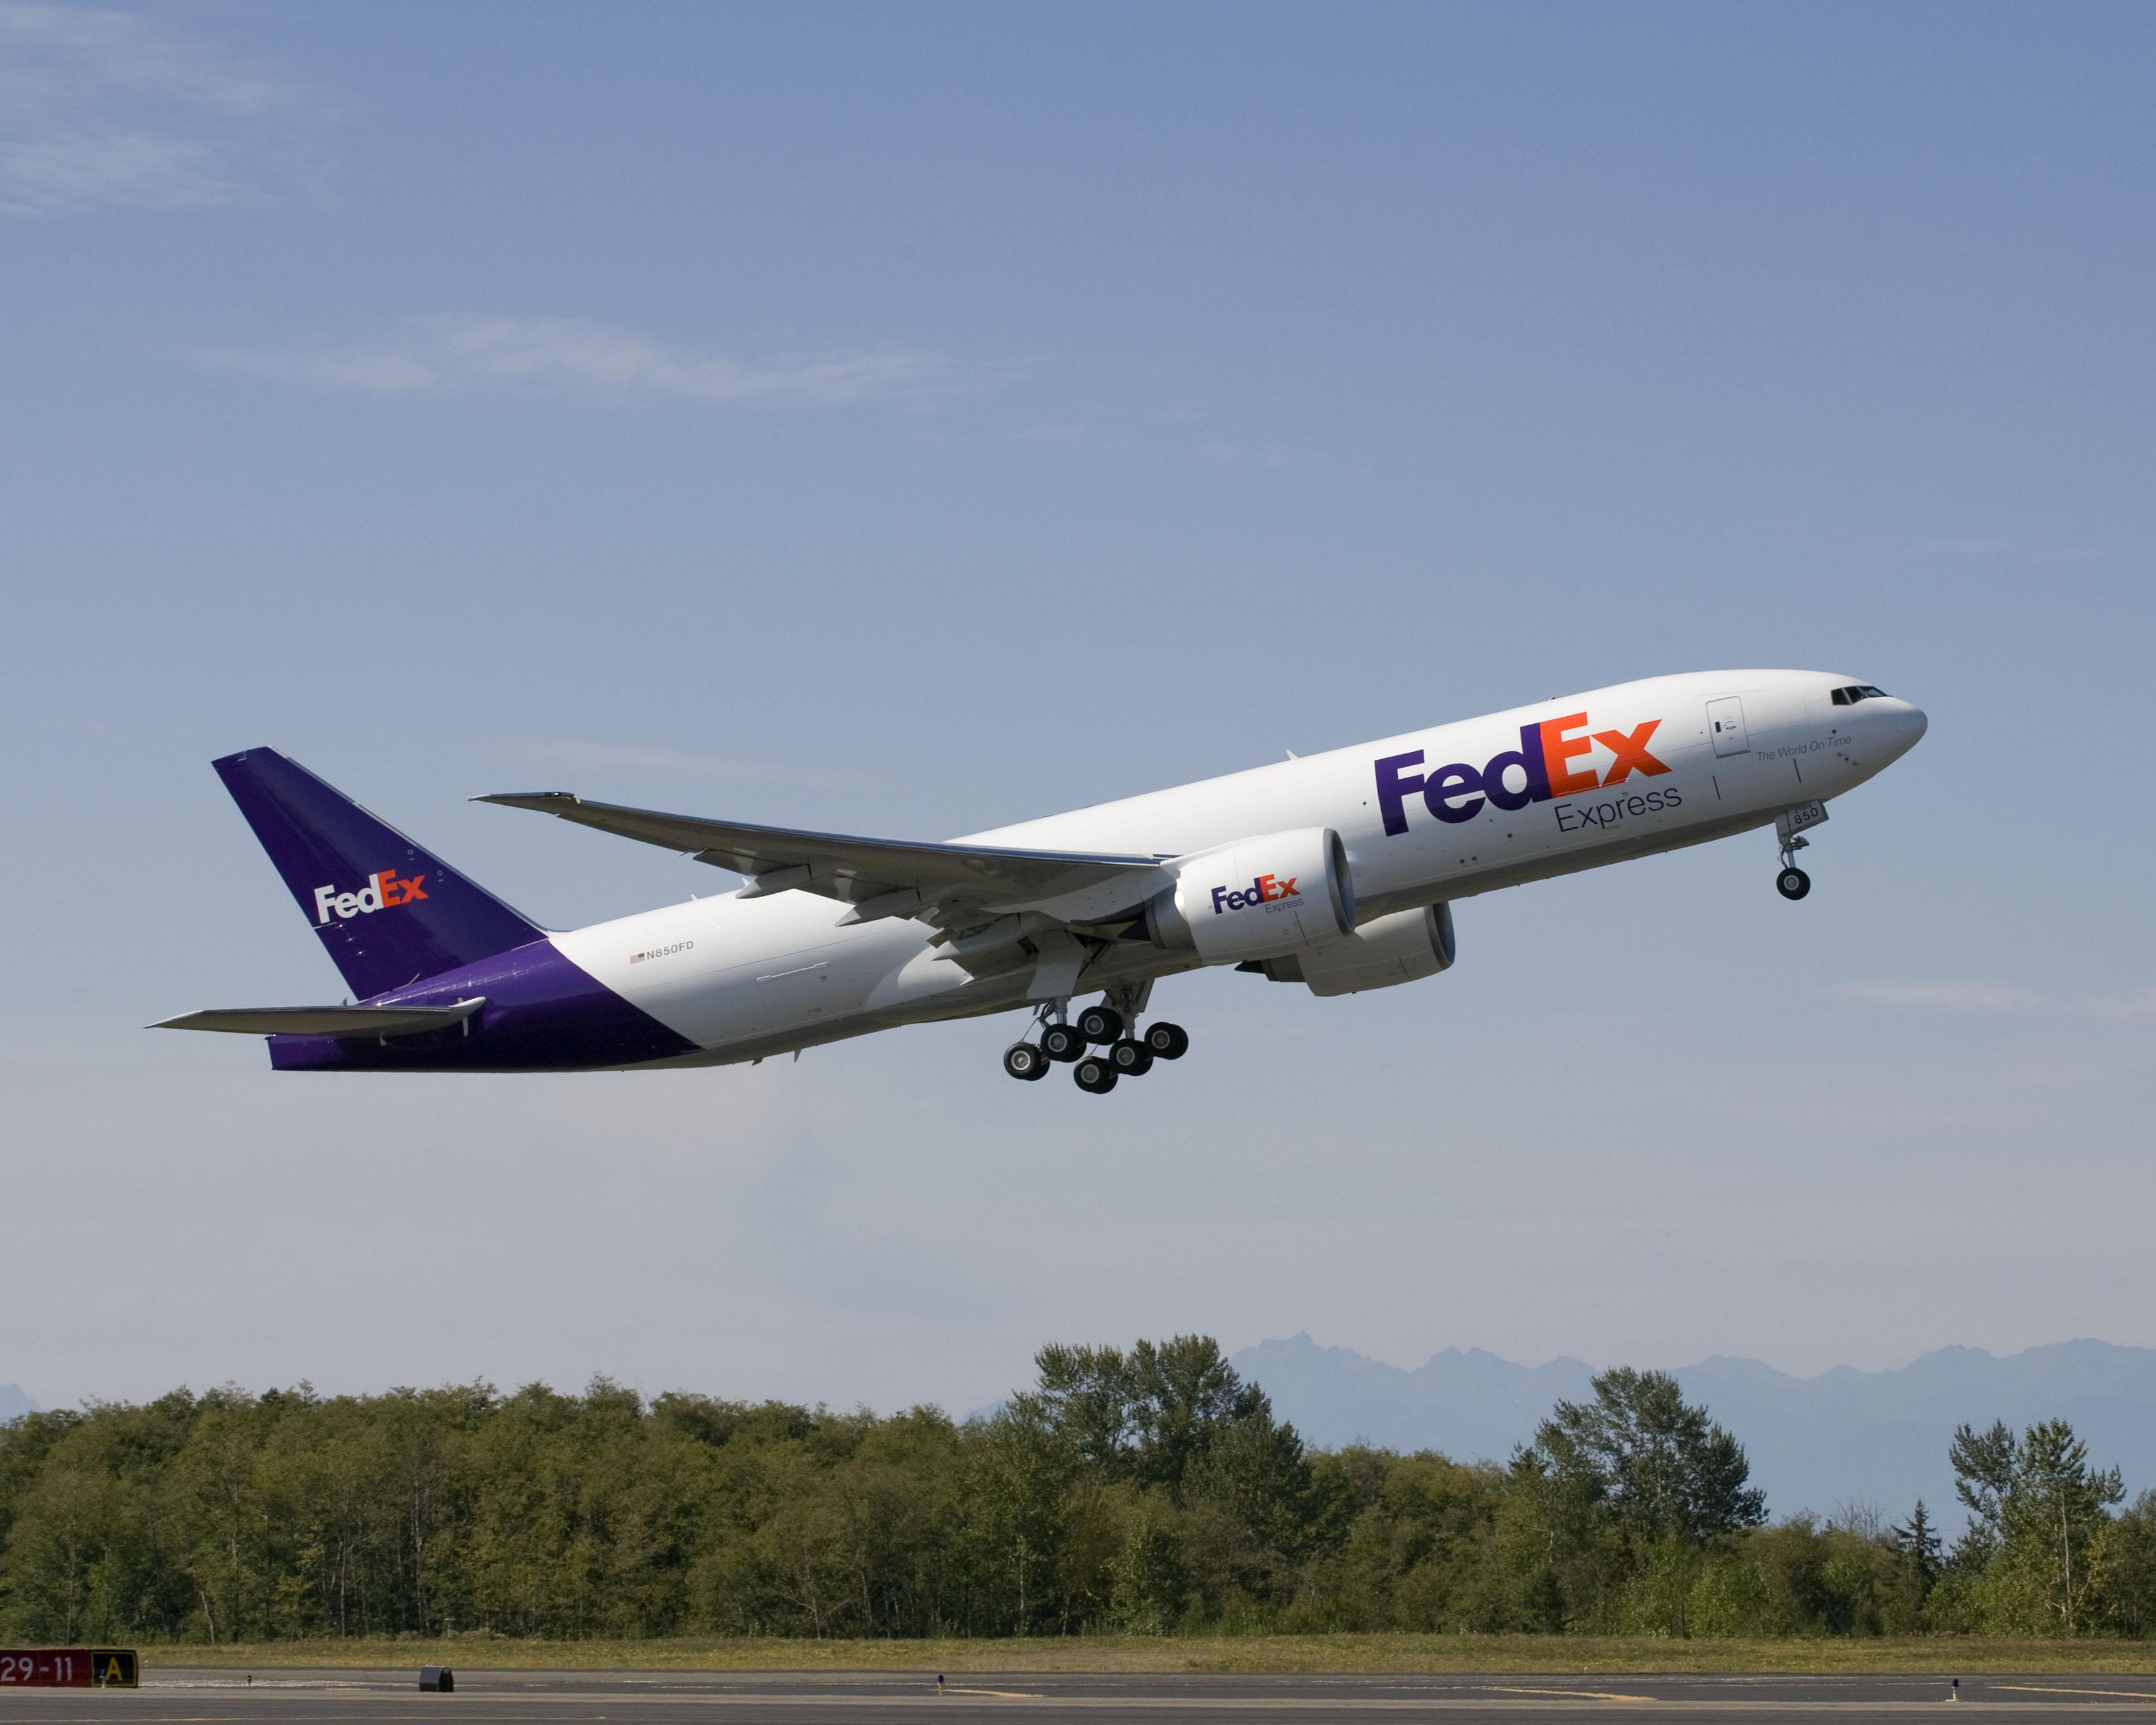 fedex燃油附加费 FedEx国际快递 UPS燃油附加费 ups国际快递 国际快递 燃油附加费 鹿跃国际快递